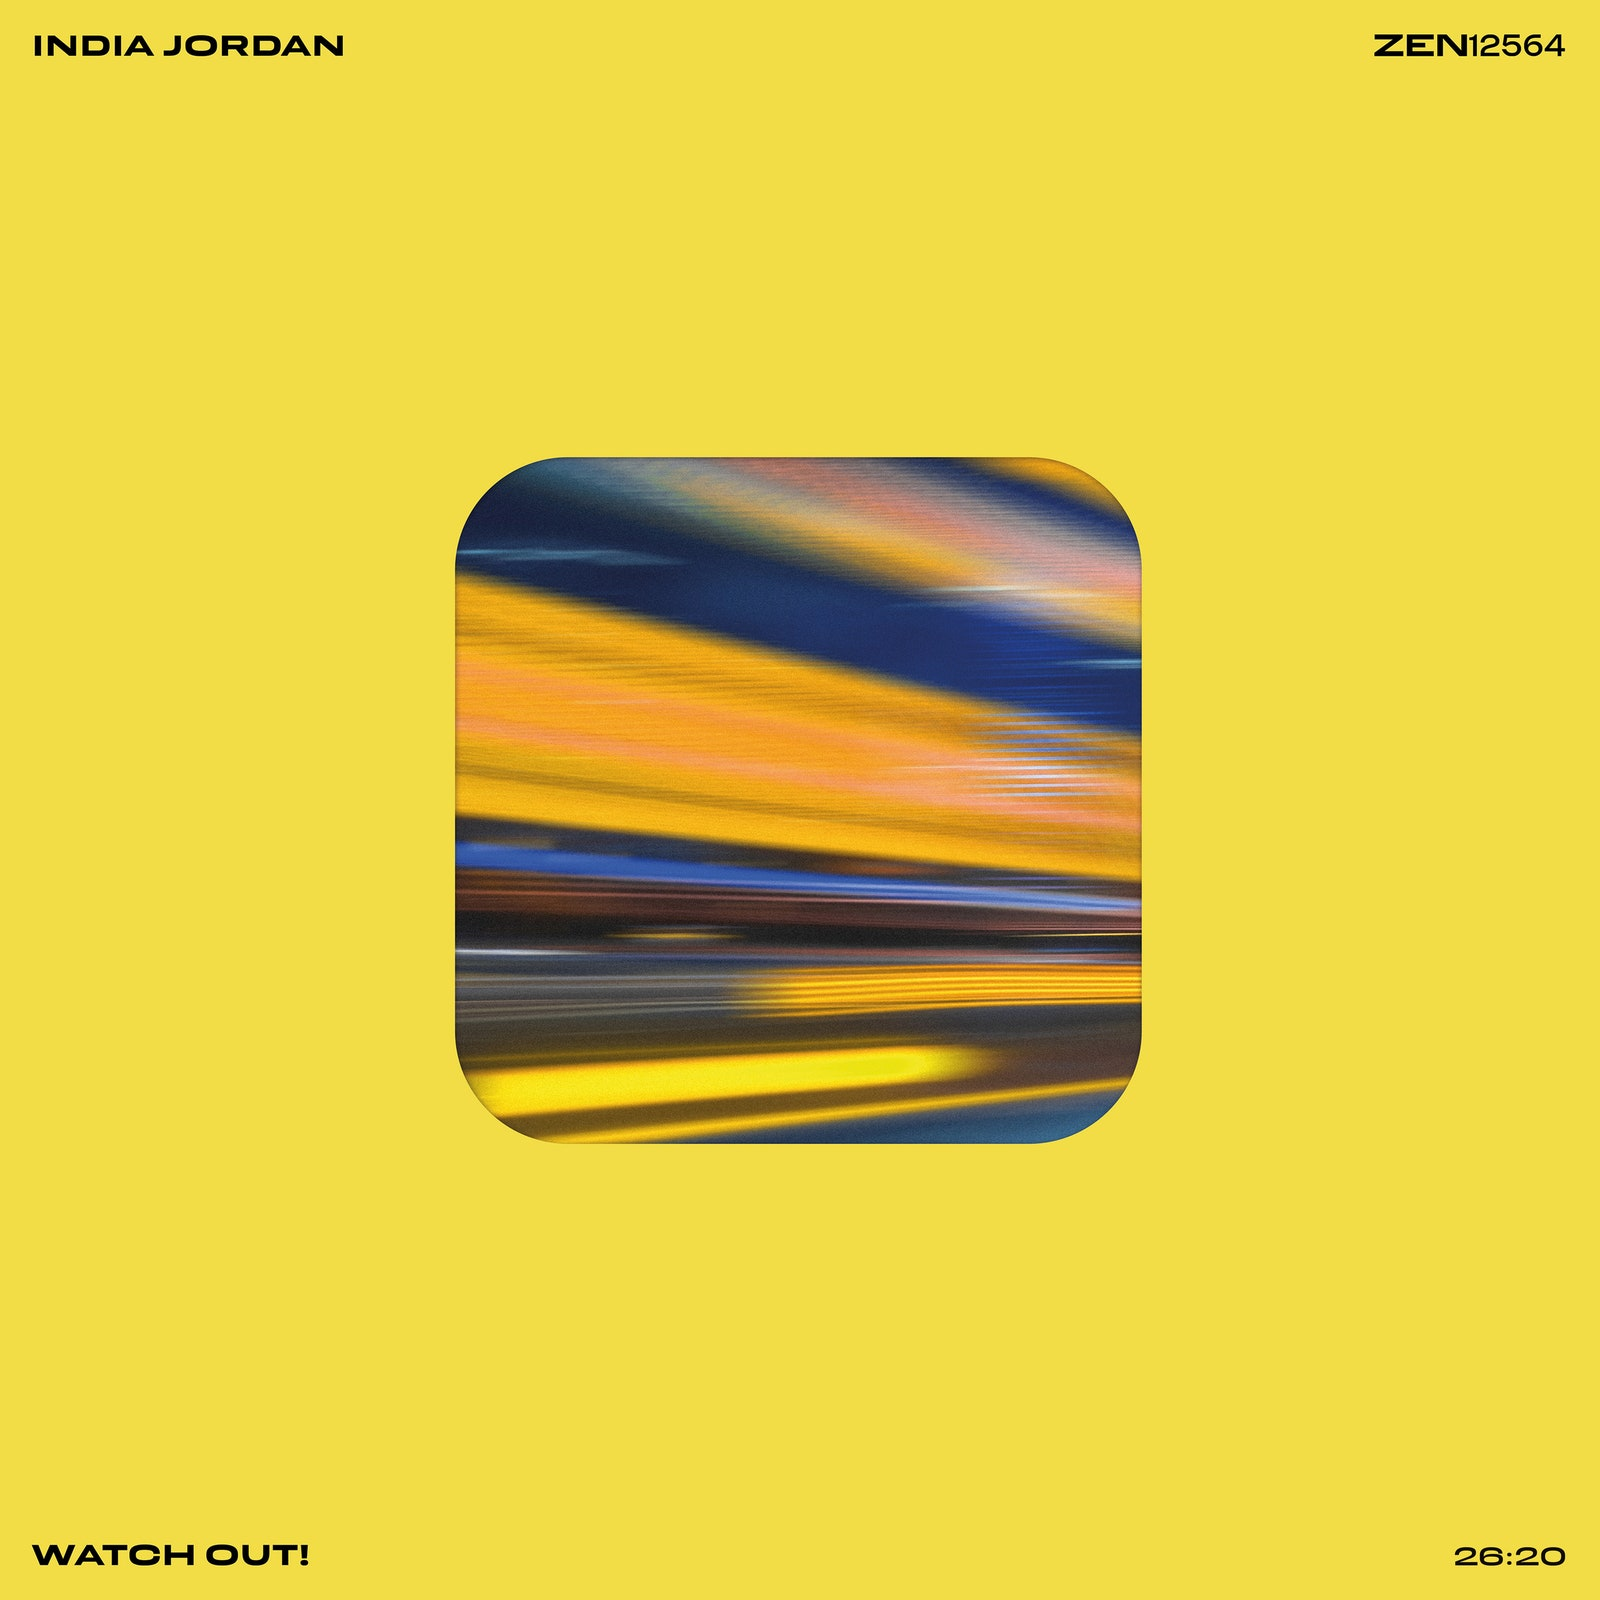 Watch Out! EP - India Jordan